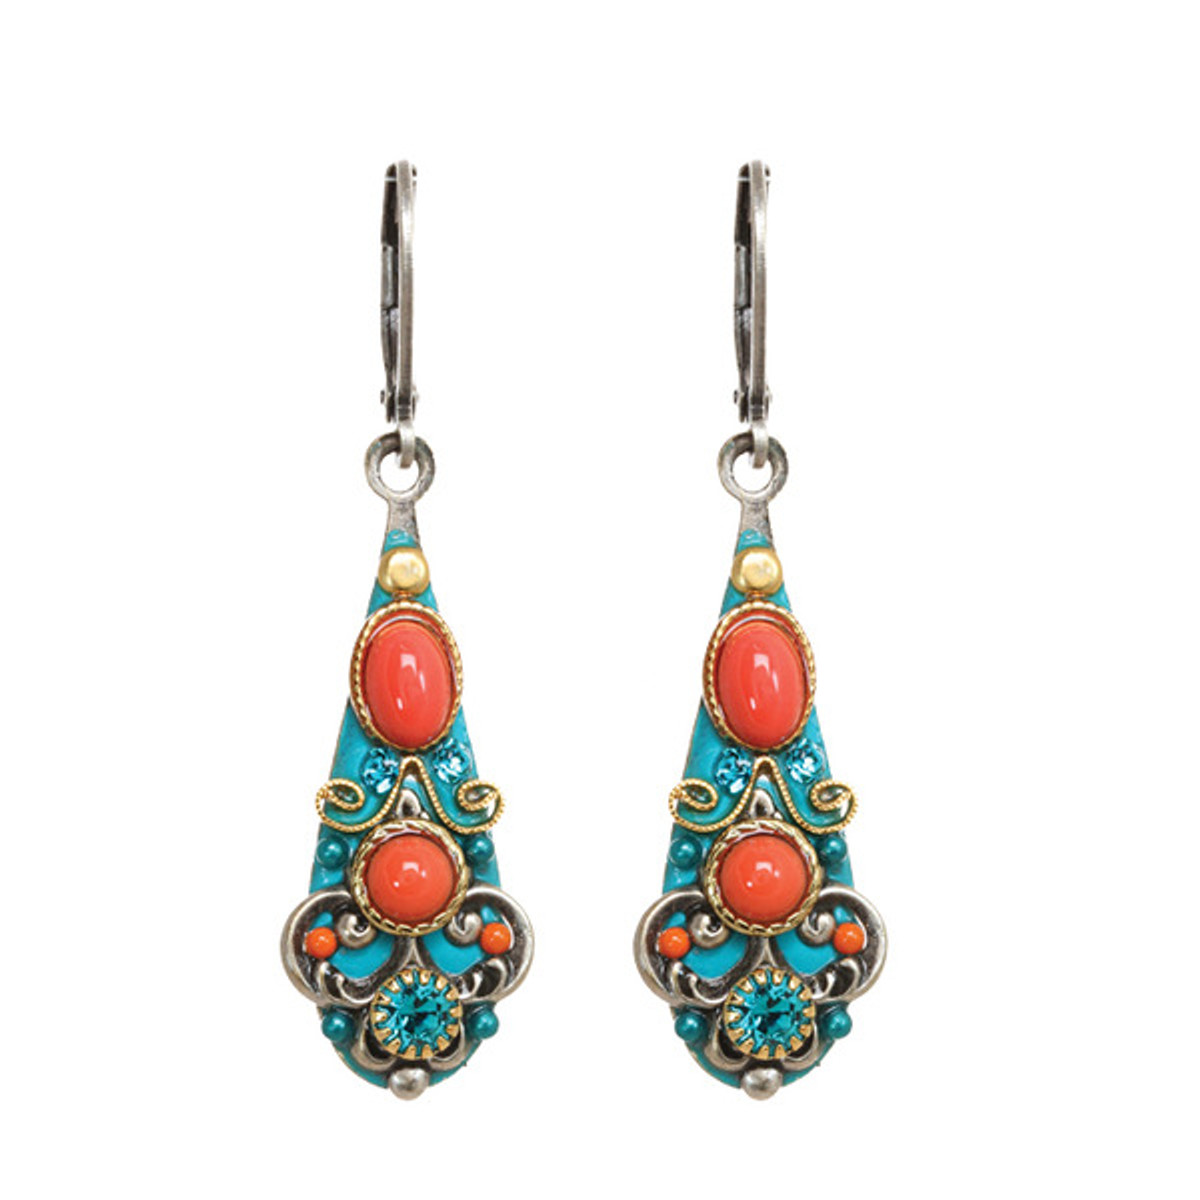 Michal Golan Jewelry Coral Sea Earrings - S7656